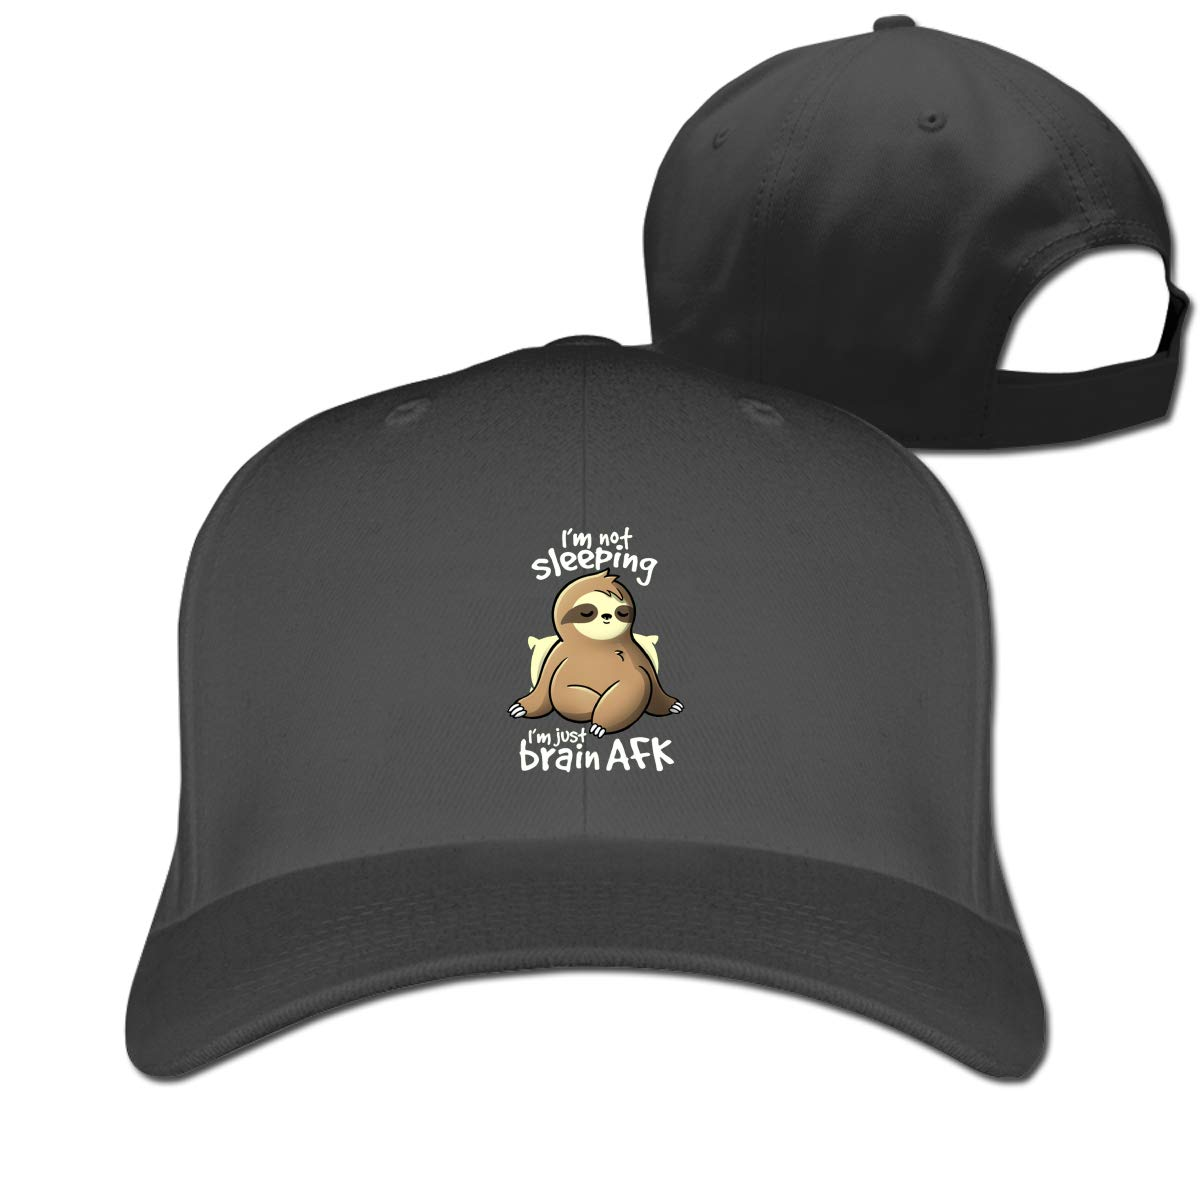 Brain AFK Sloth Fashion Adjustable Cotton Baseball Caps Trucker Driver Hat Outdoor Cap Black